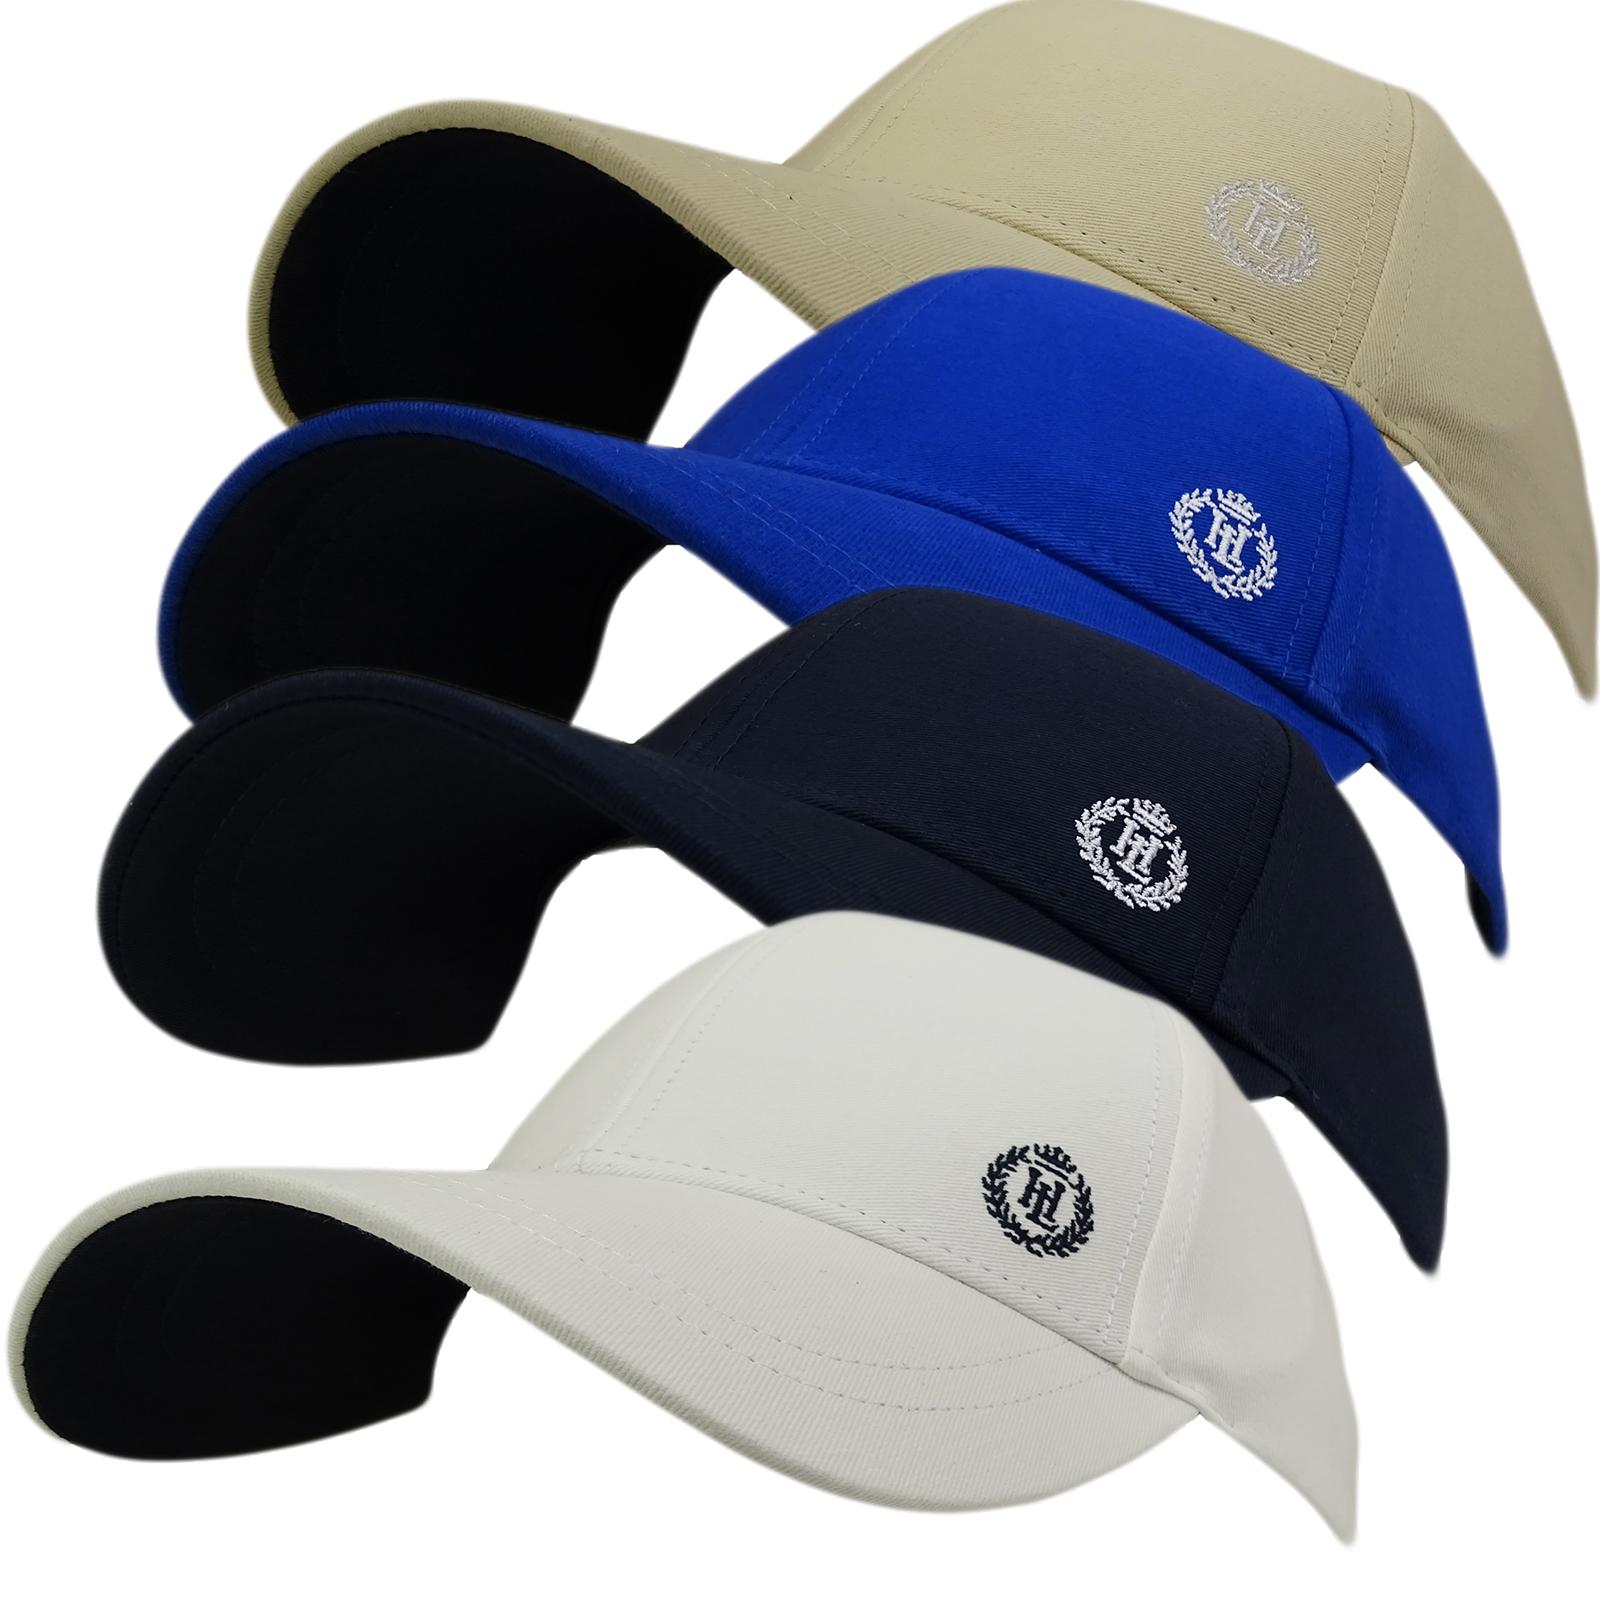 Henri Lloyd Baseball Cap With Adjustable Back Cap / Headwear Carter